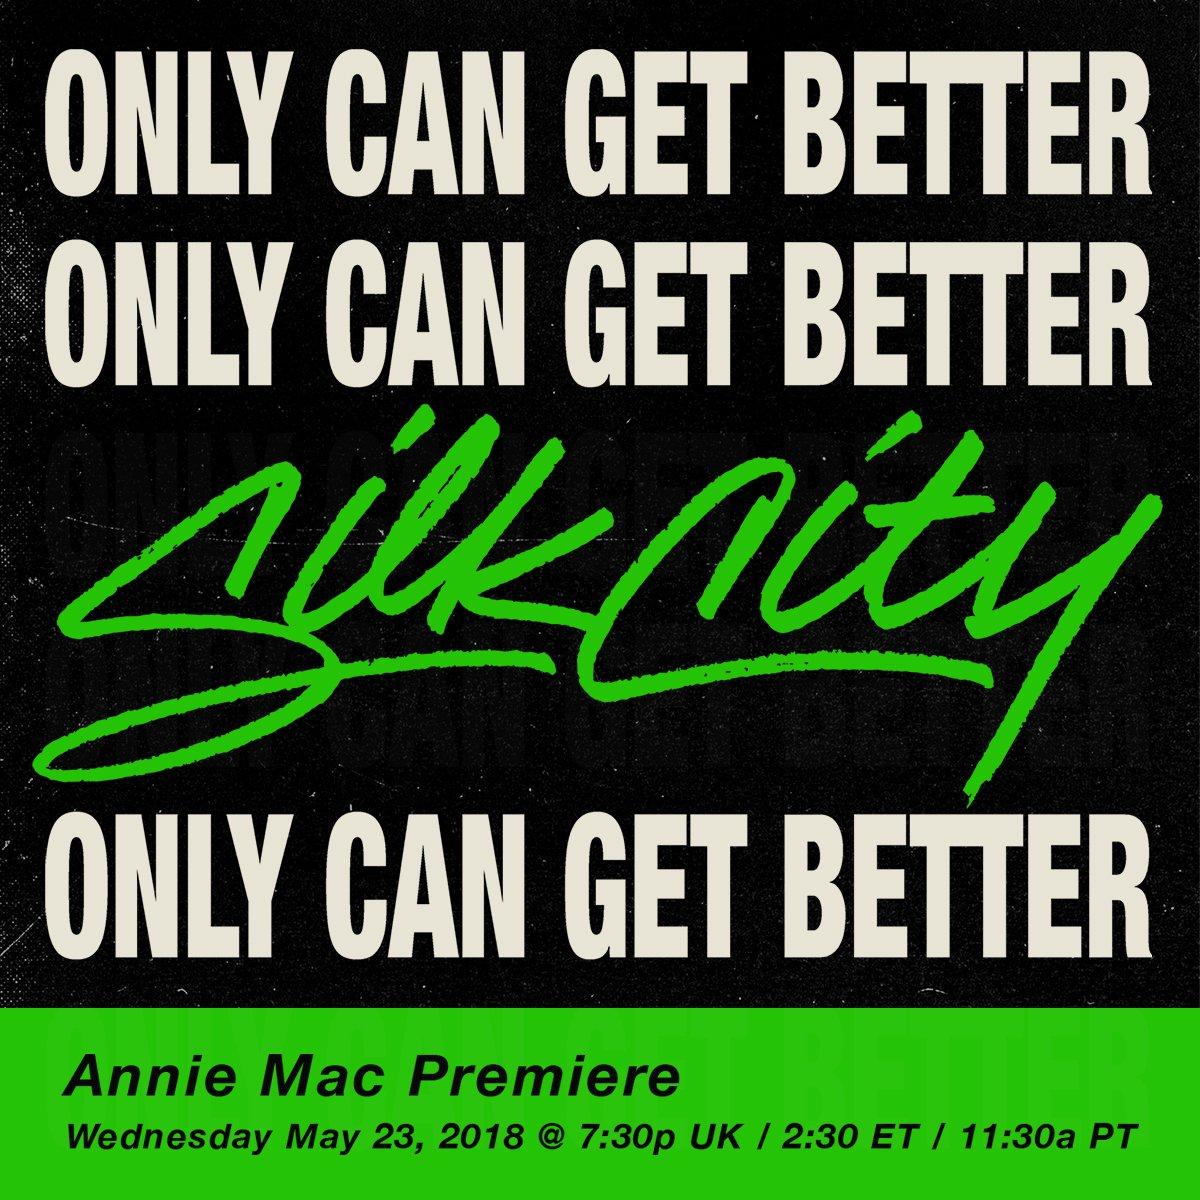 coming in 1 hour @anniemac @bbcr1 @markronson #silkcity https://t.co/gIAza9q0di